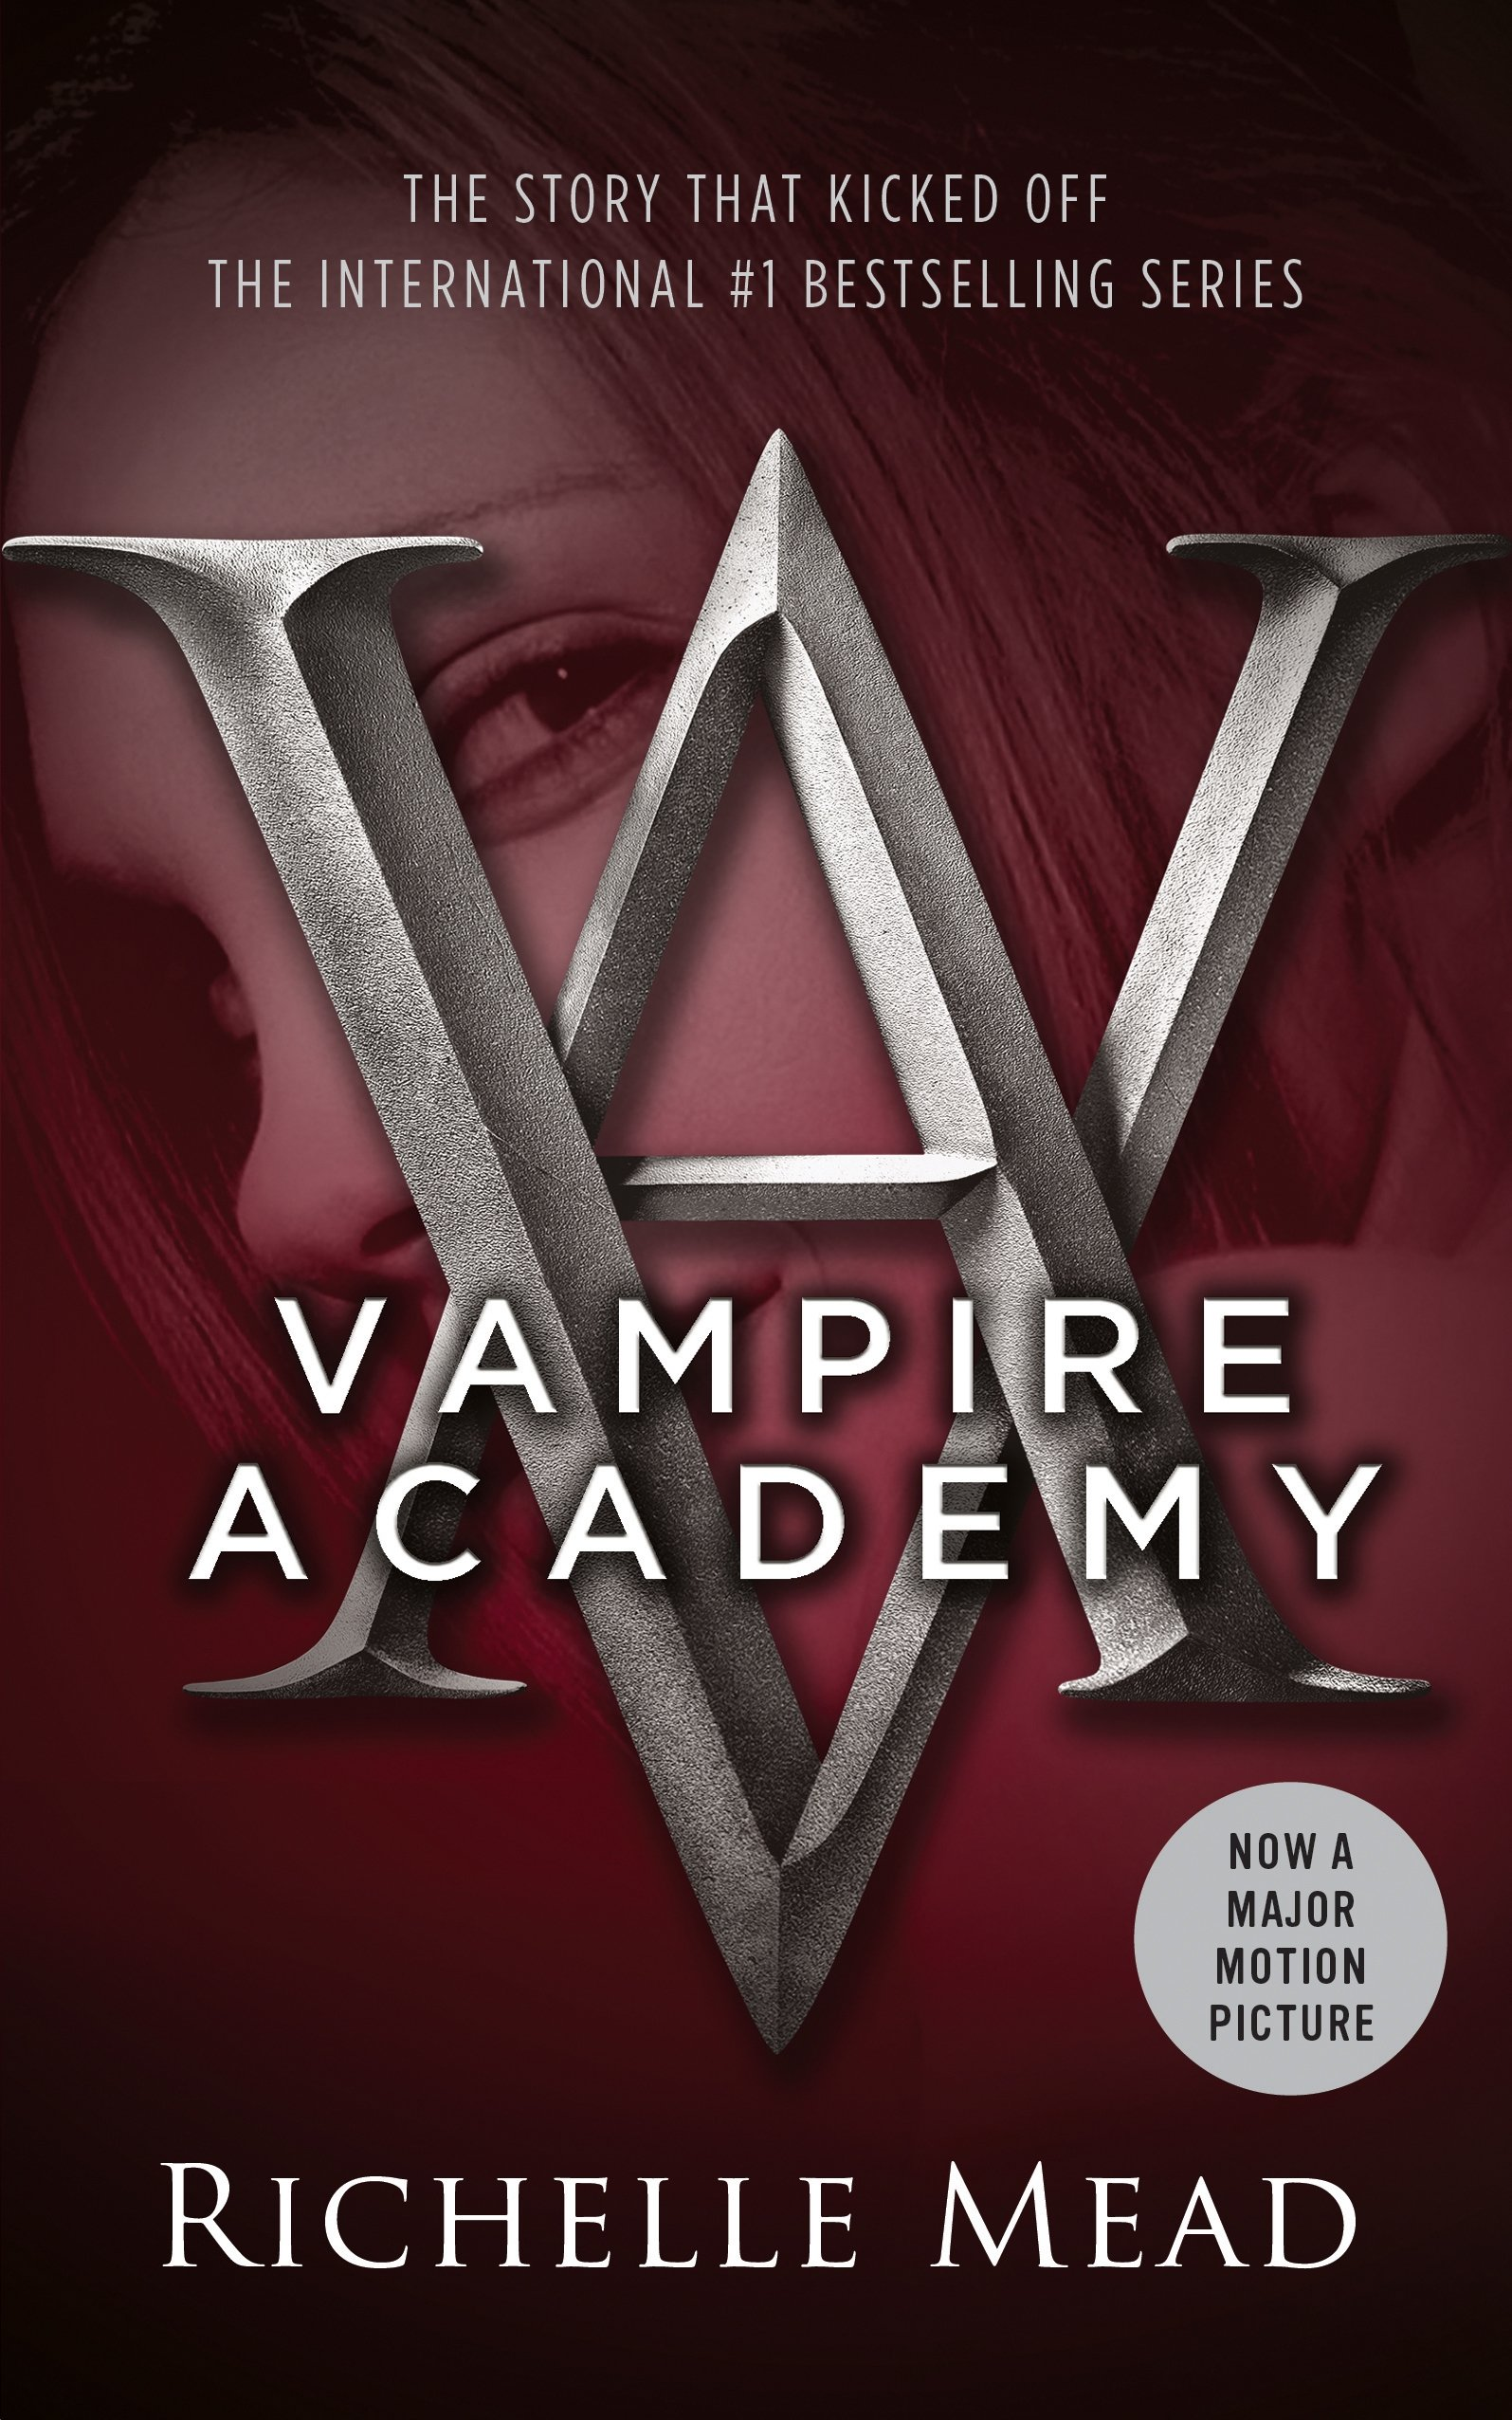 Vampire Academy: Richelle Mead: 9781595141743: Amazon.com: Books